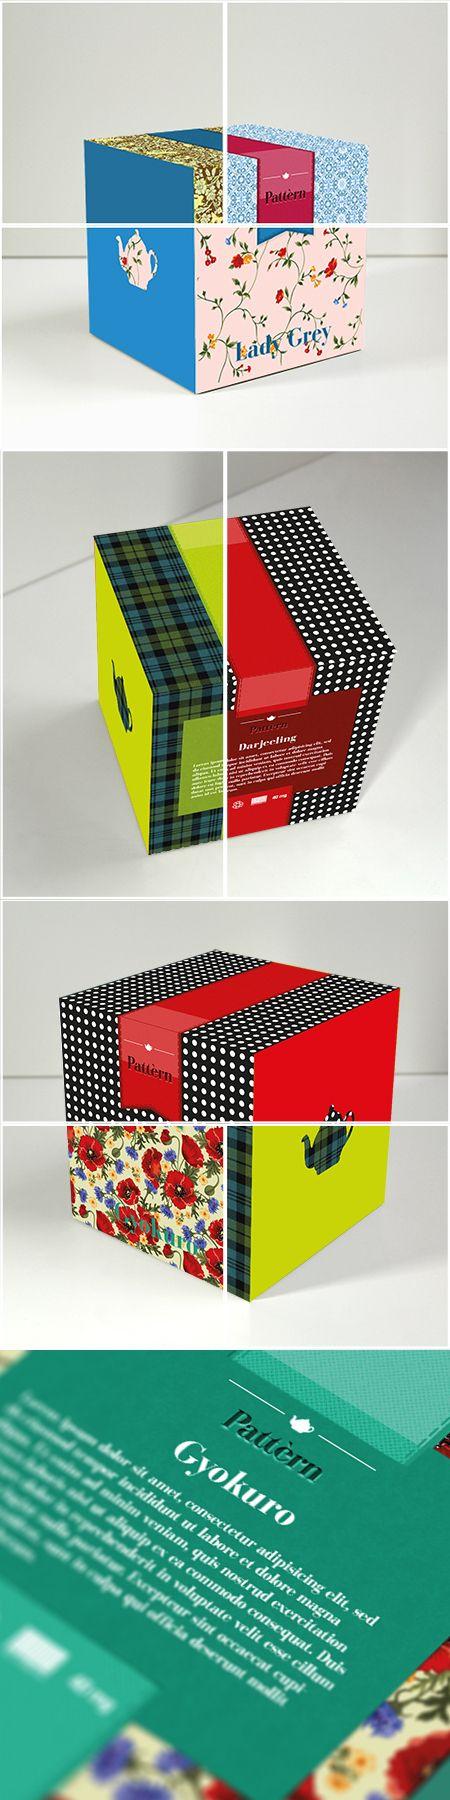 Pattèrn - Tea Packaging by Oriana Gaeta, via Behance